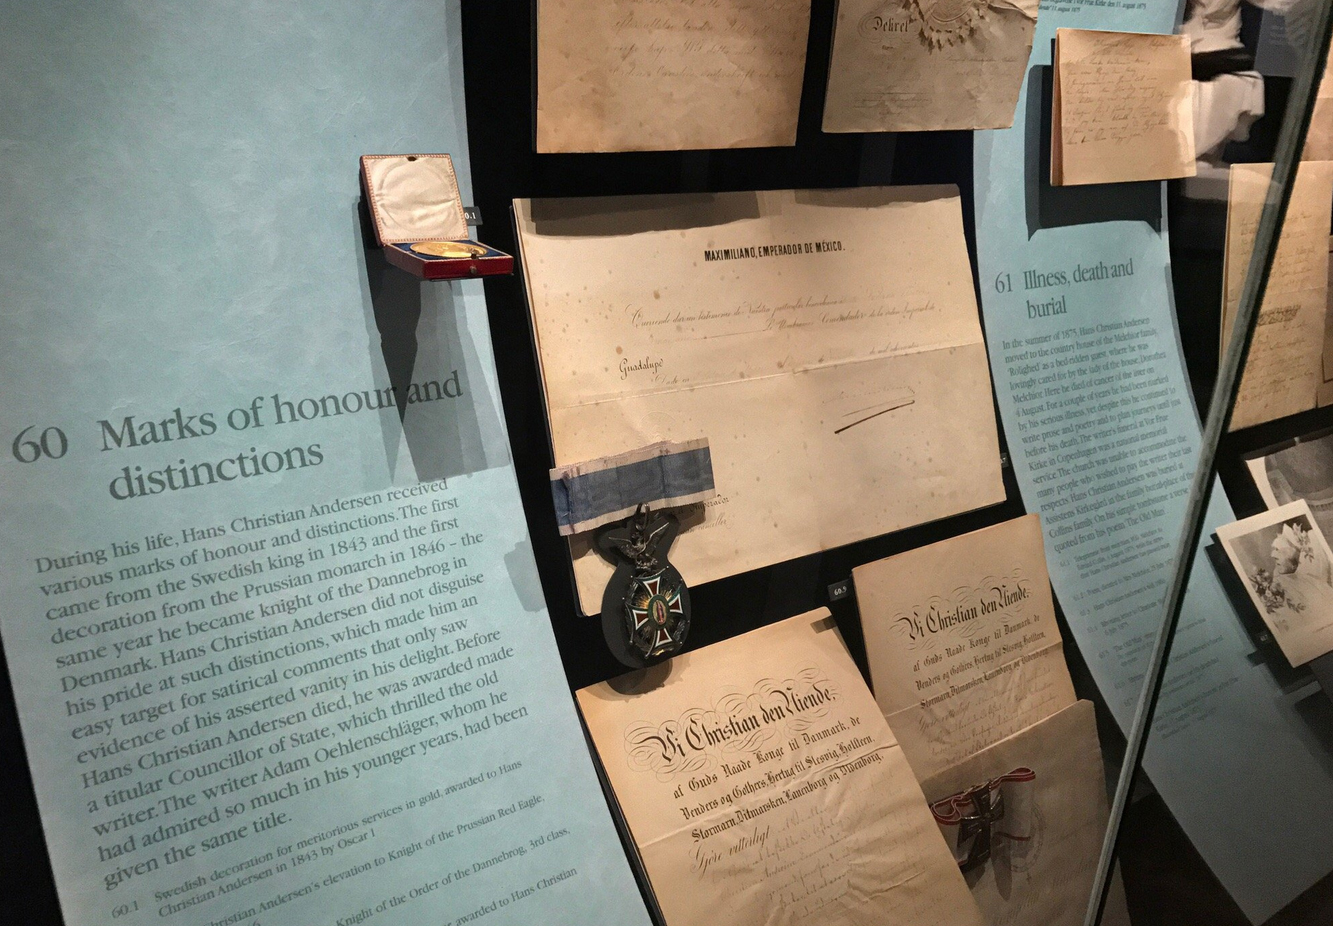 В музее Ганса Христиана Андерсена